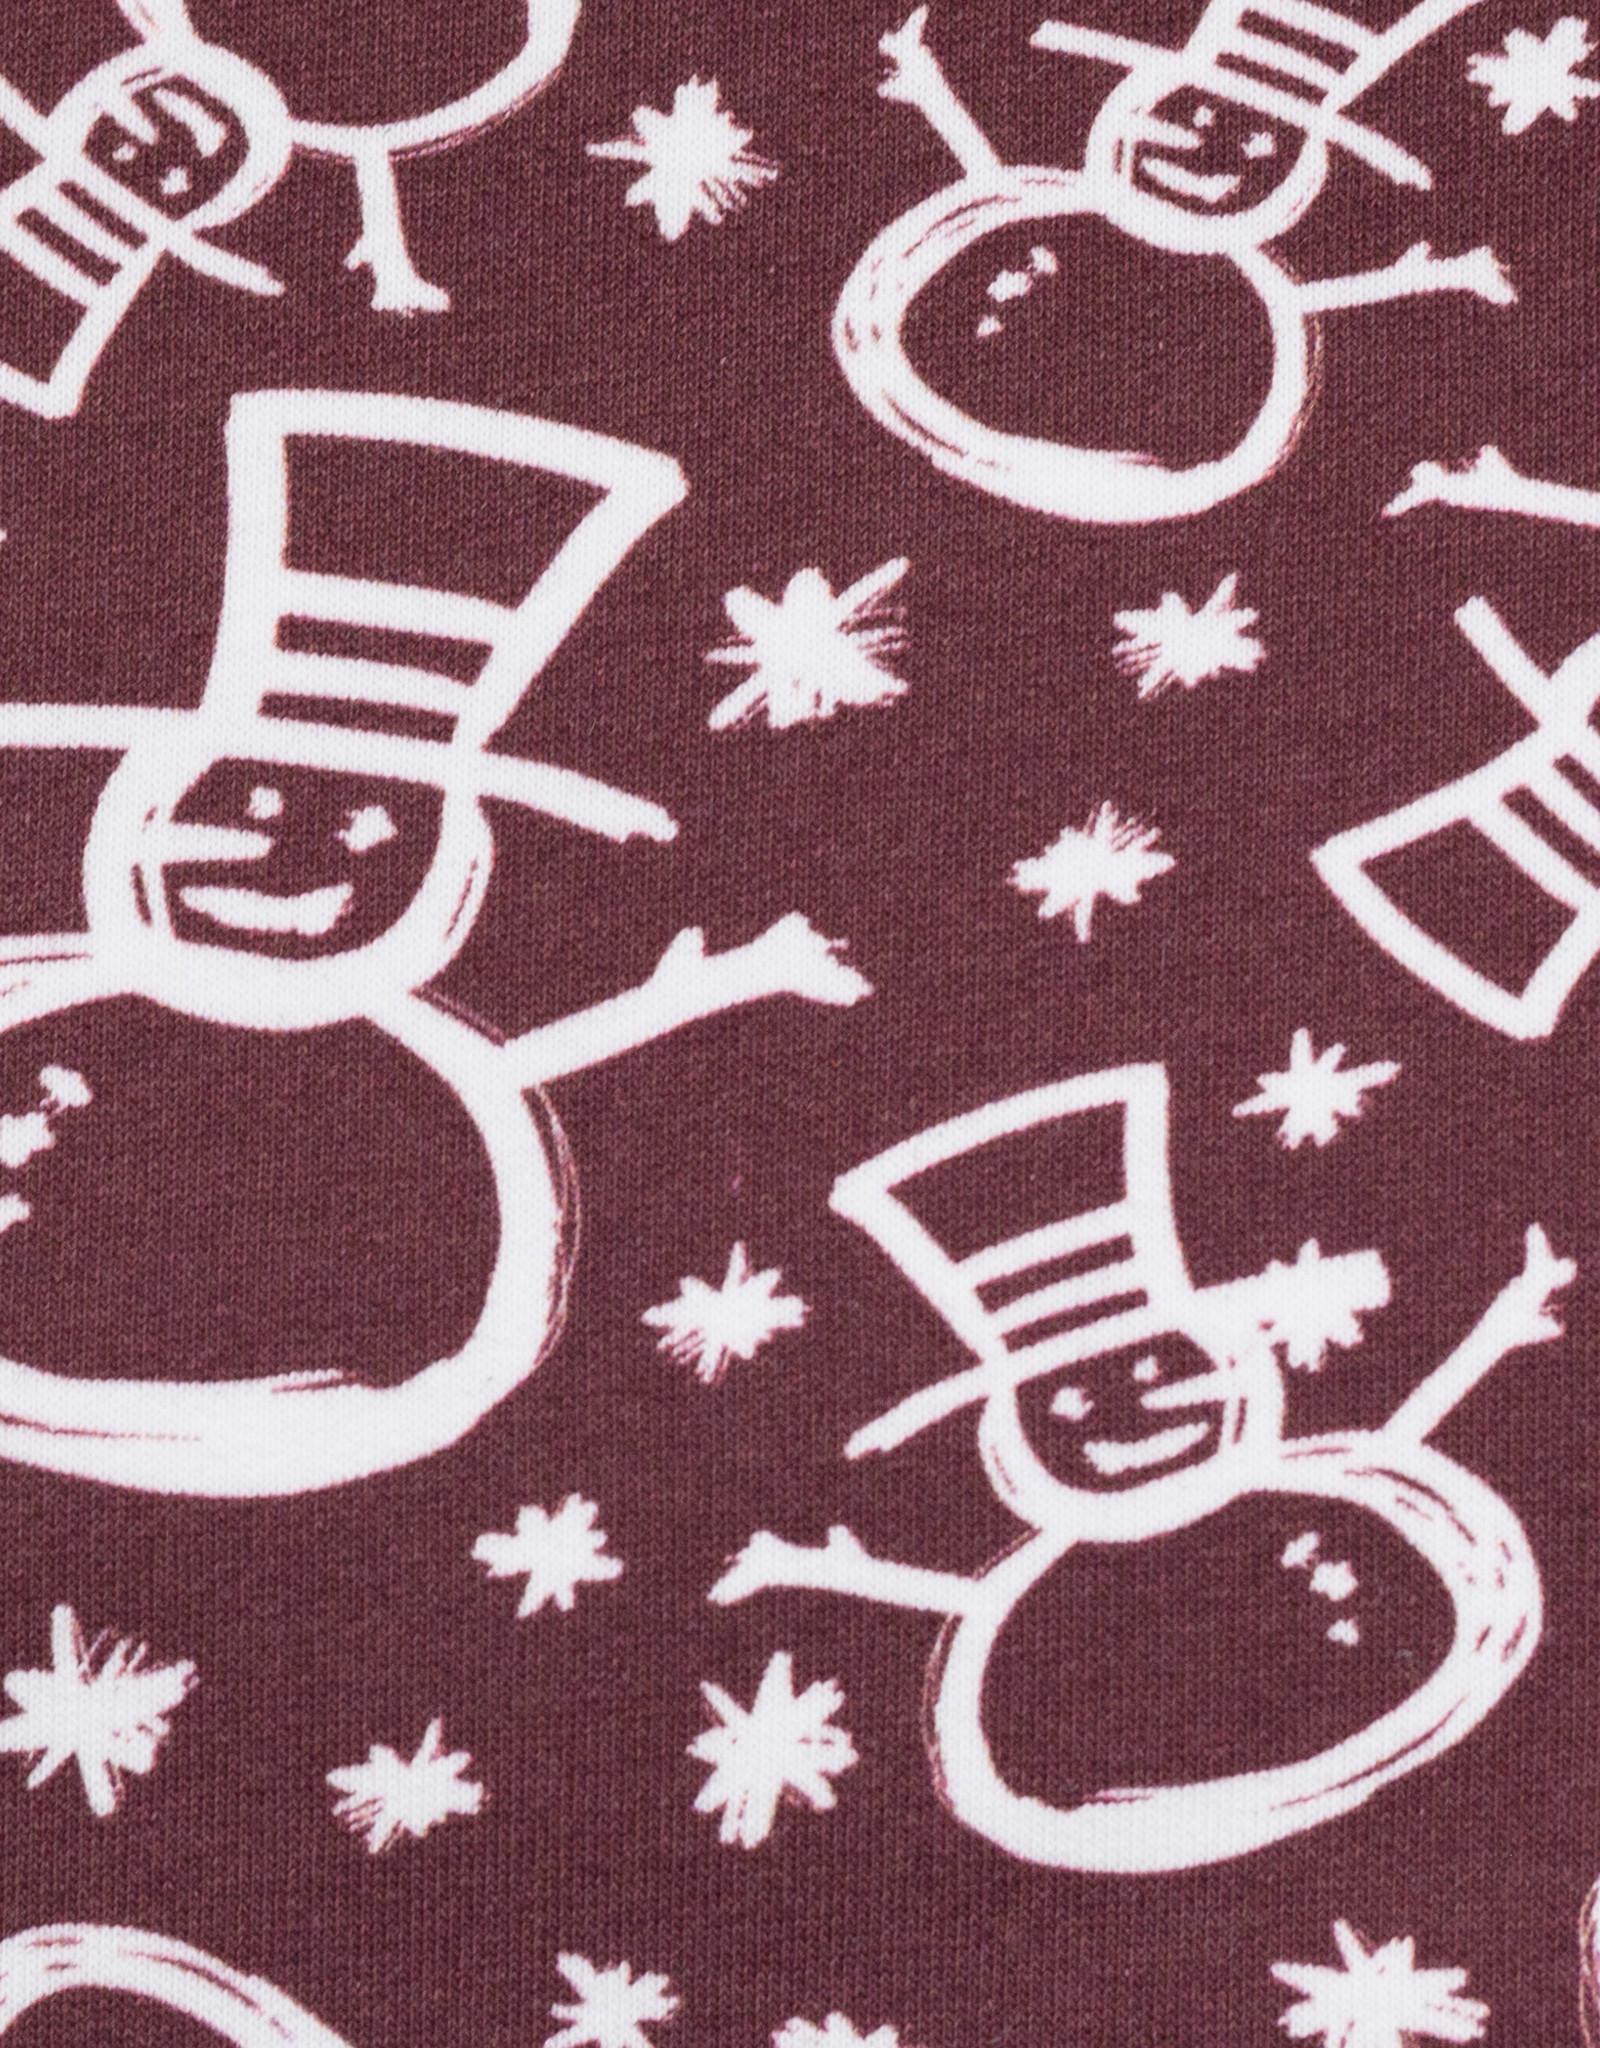 Jogging snowman